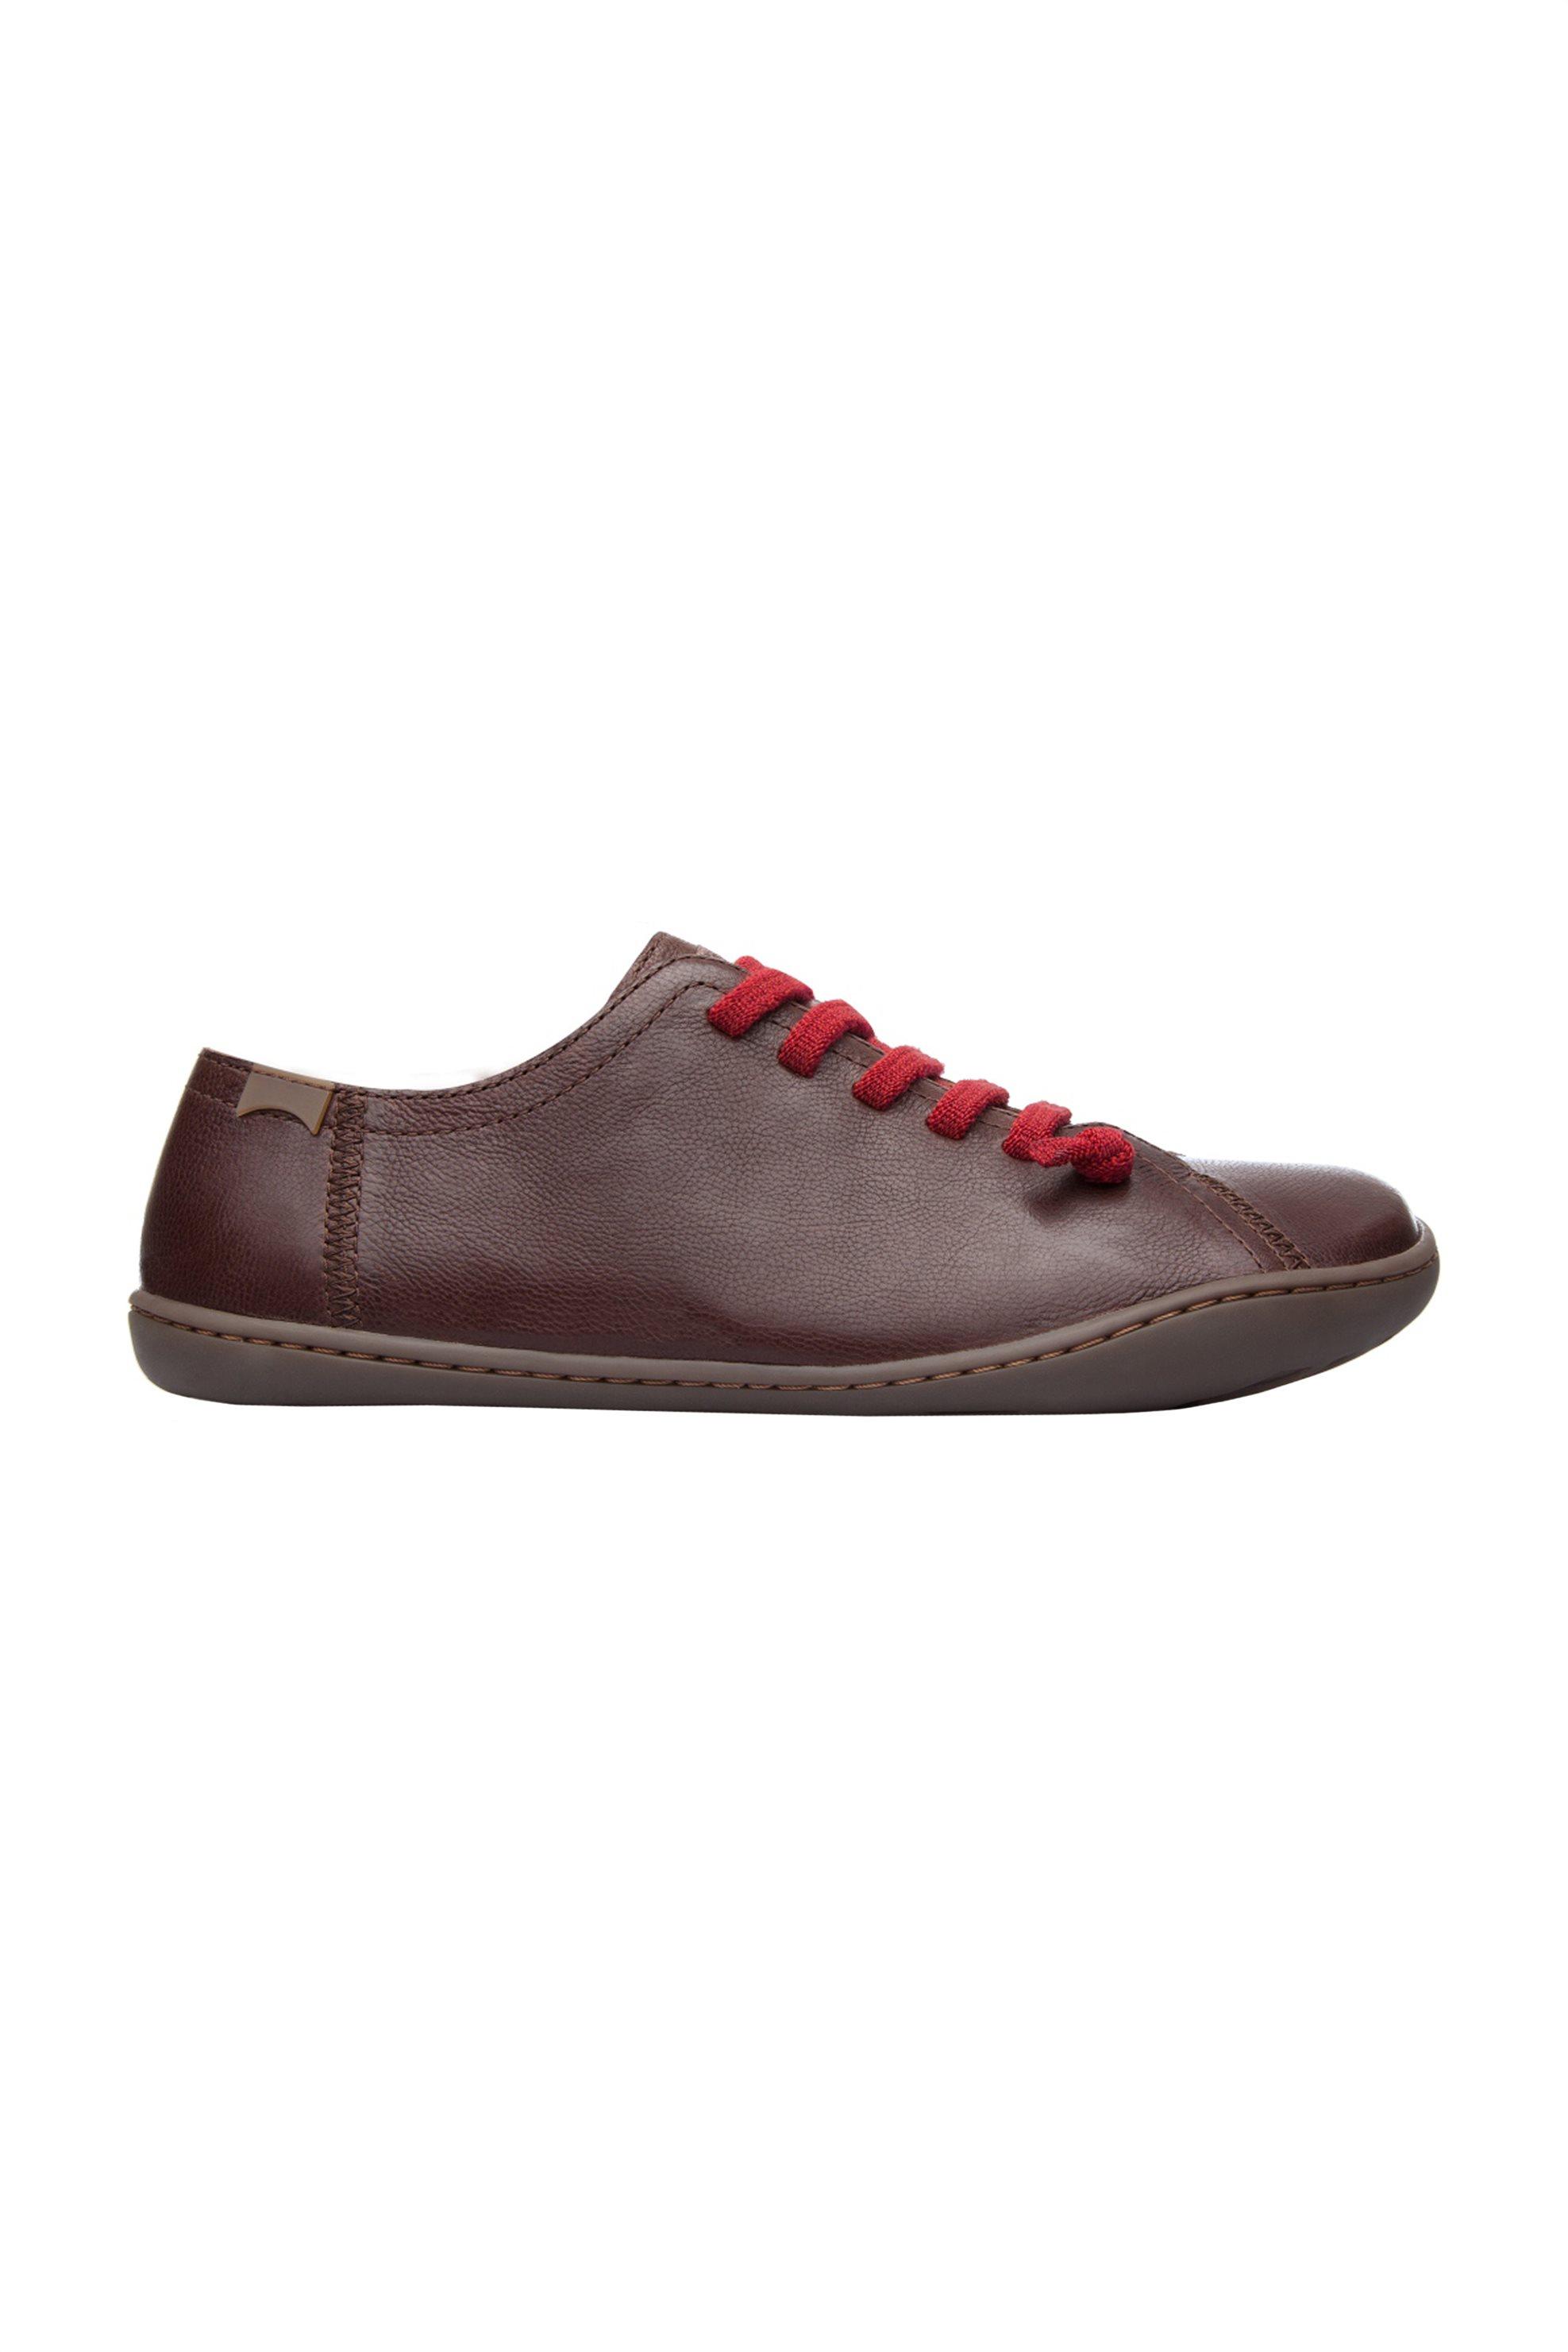 Notos Camper γυναικεία παπούτσια δερμάτινα καφέ Peu – 20848-020 – Καφέ f0a7713e36b